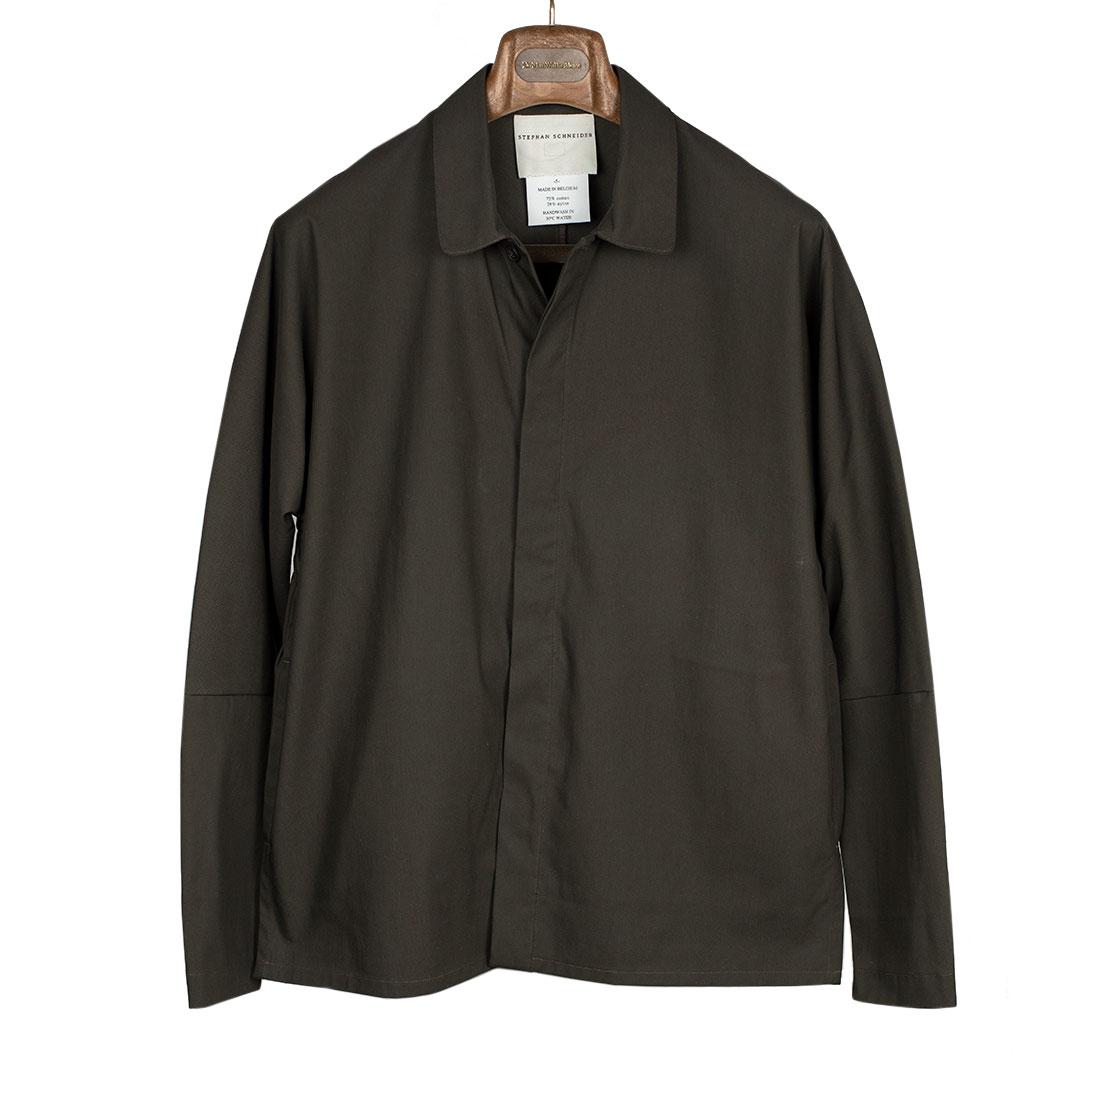 Stephan Schneider Spring Summer 2021 SS21 dolman sleeve shirt jacket (8).jpg